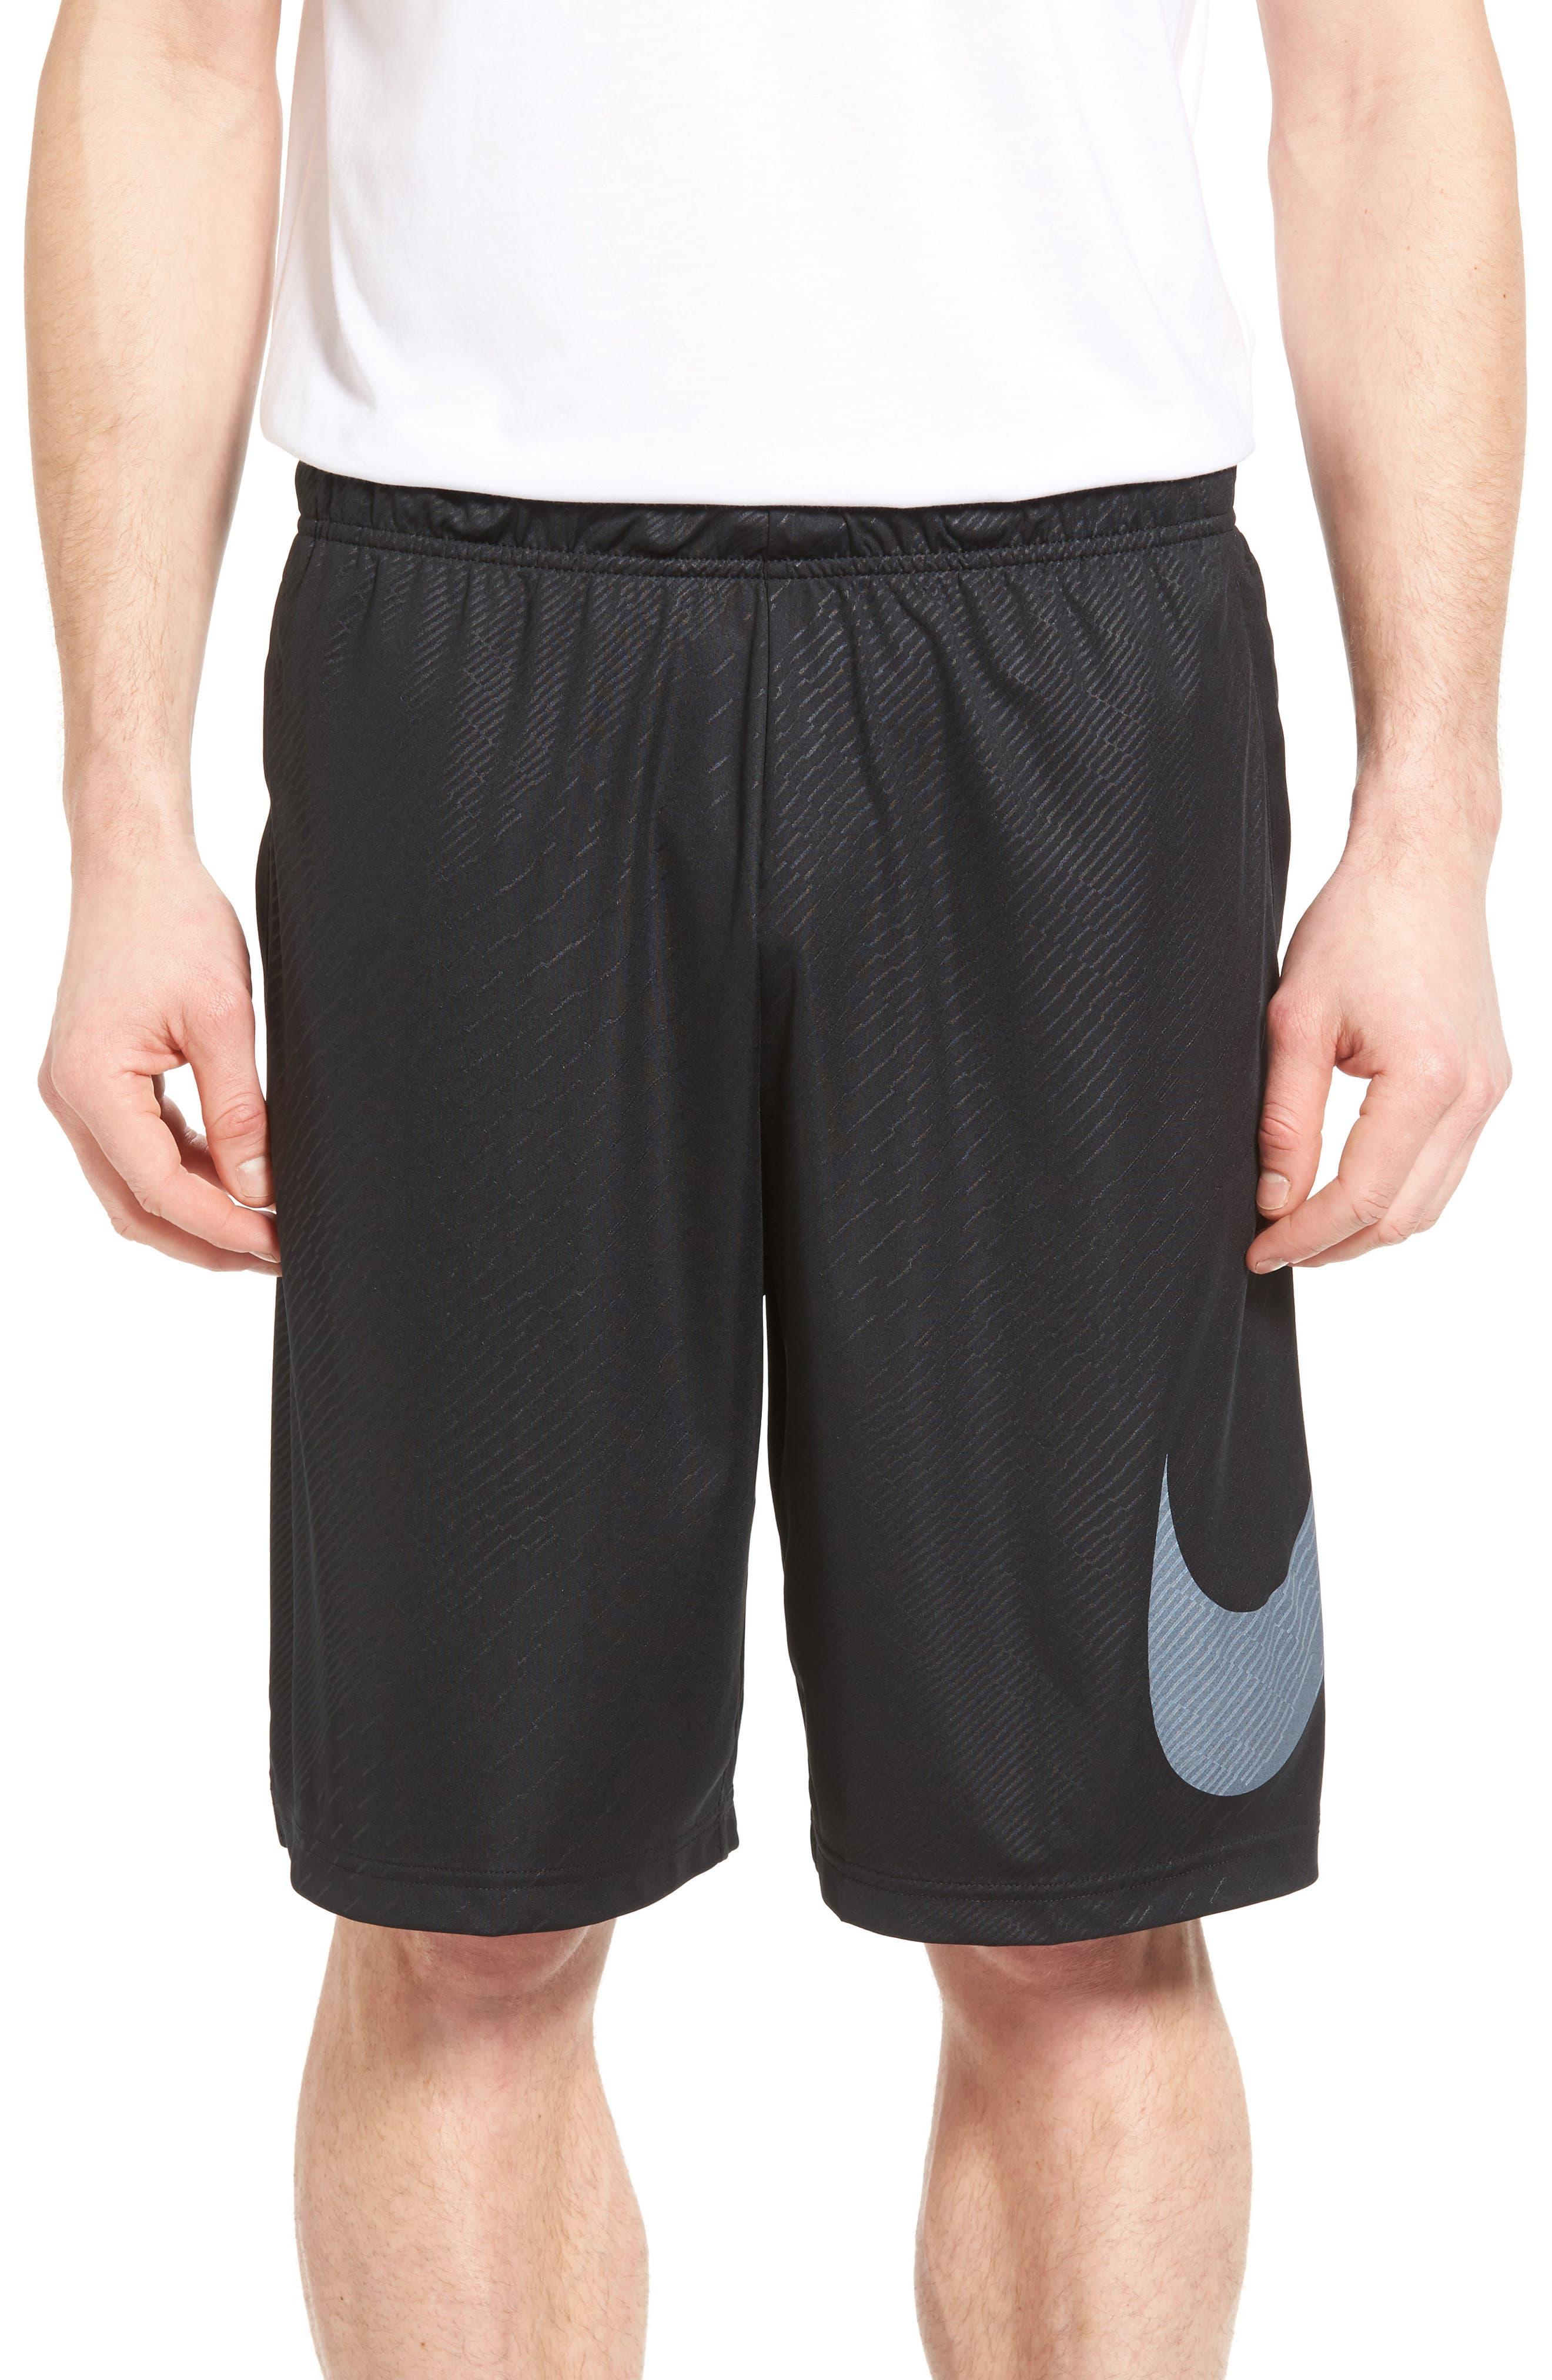 Dry Training Shorts,                         Main,                         color, Black/ White